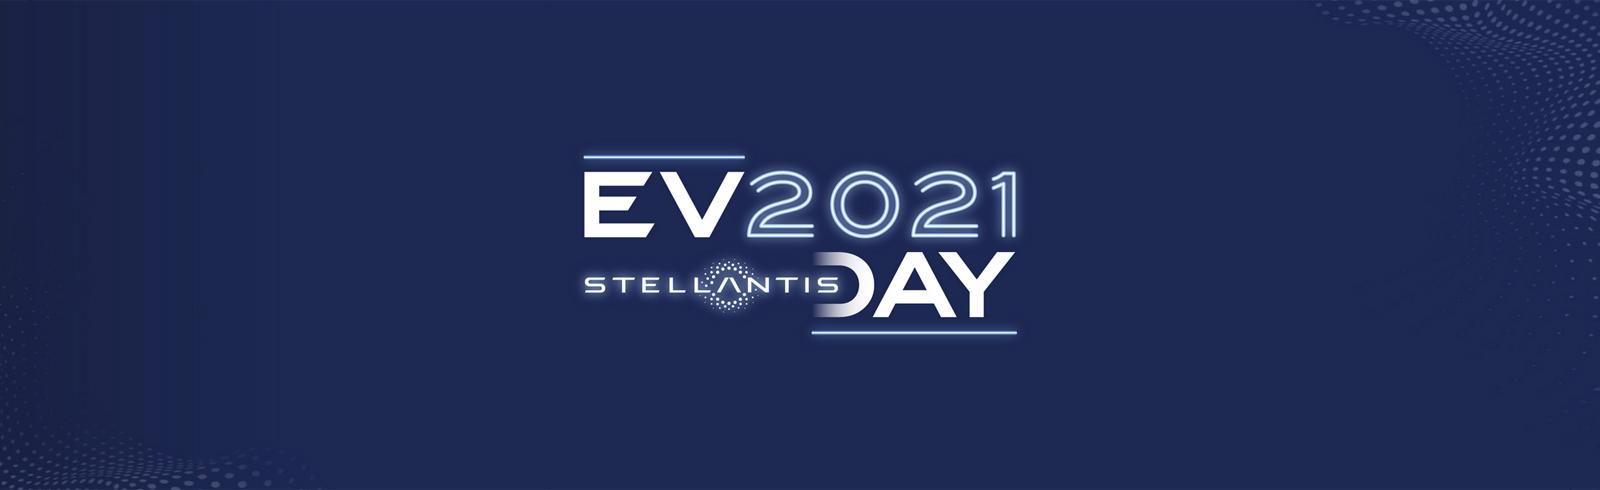 Stellantis will host an EV Day on July 8, 2021